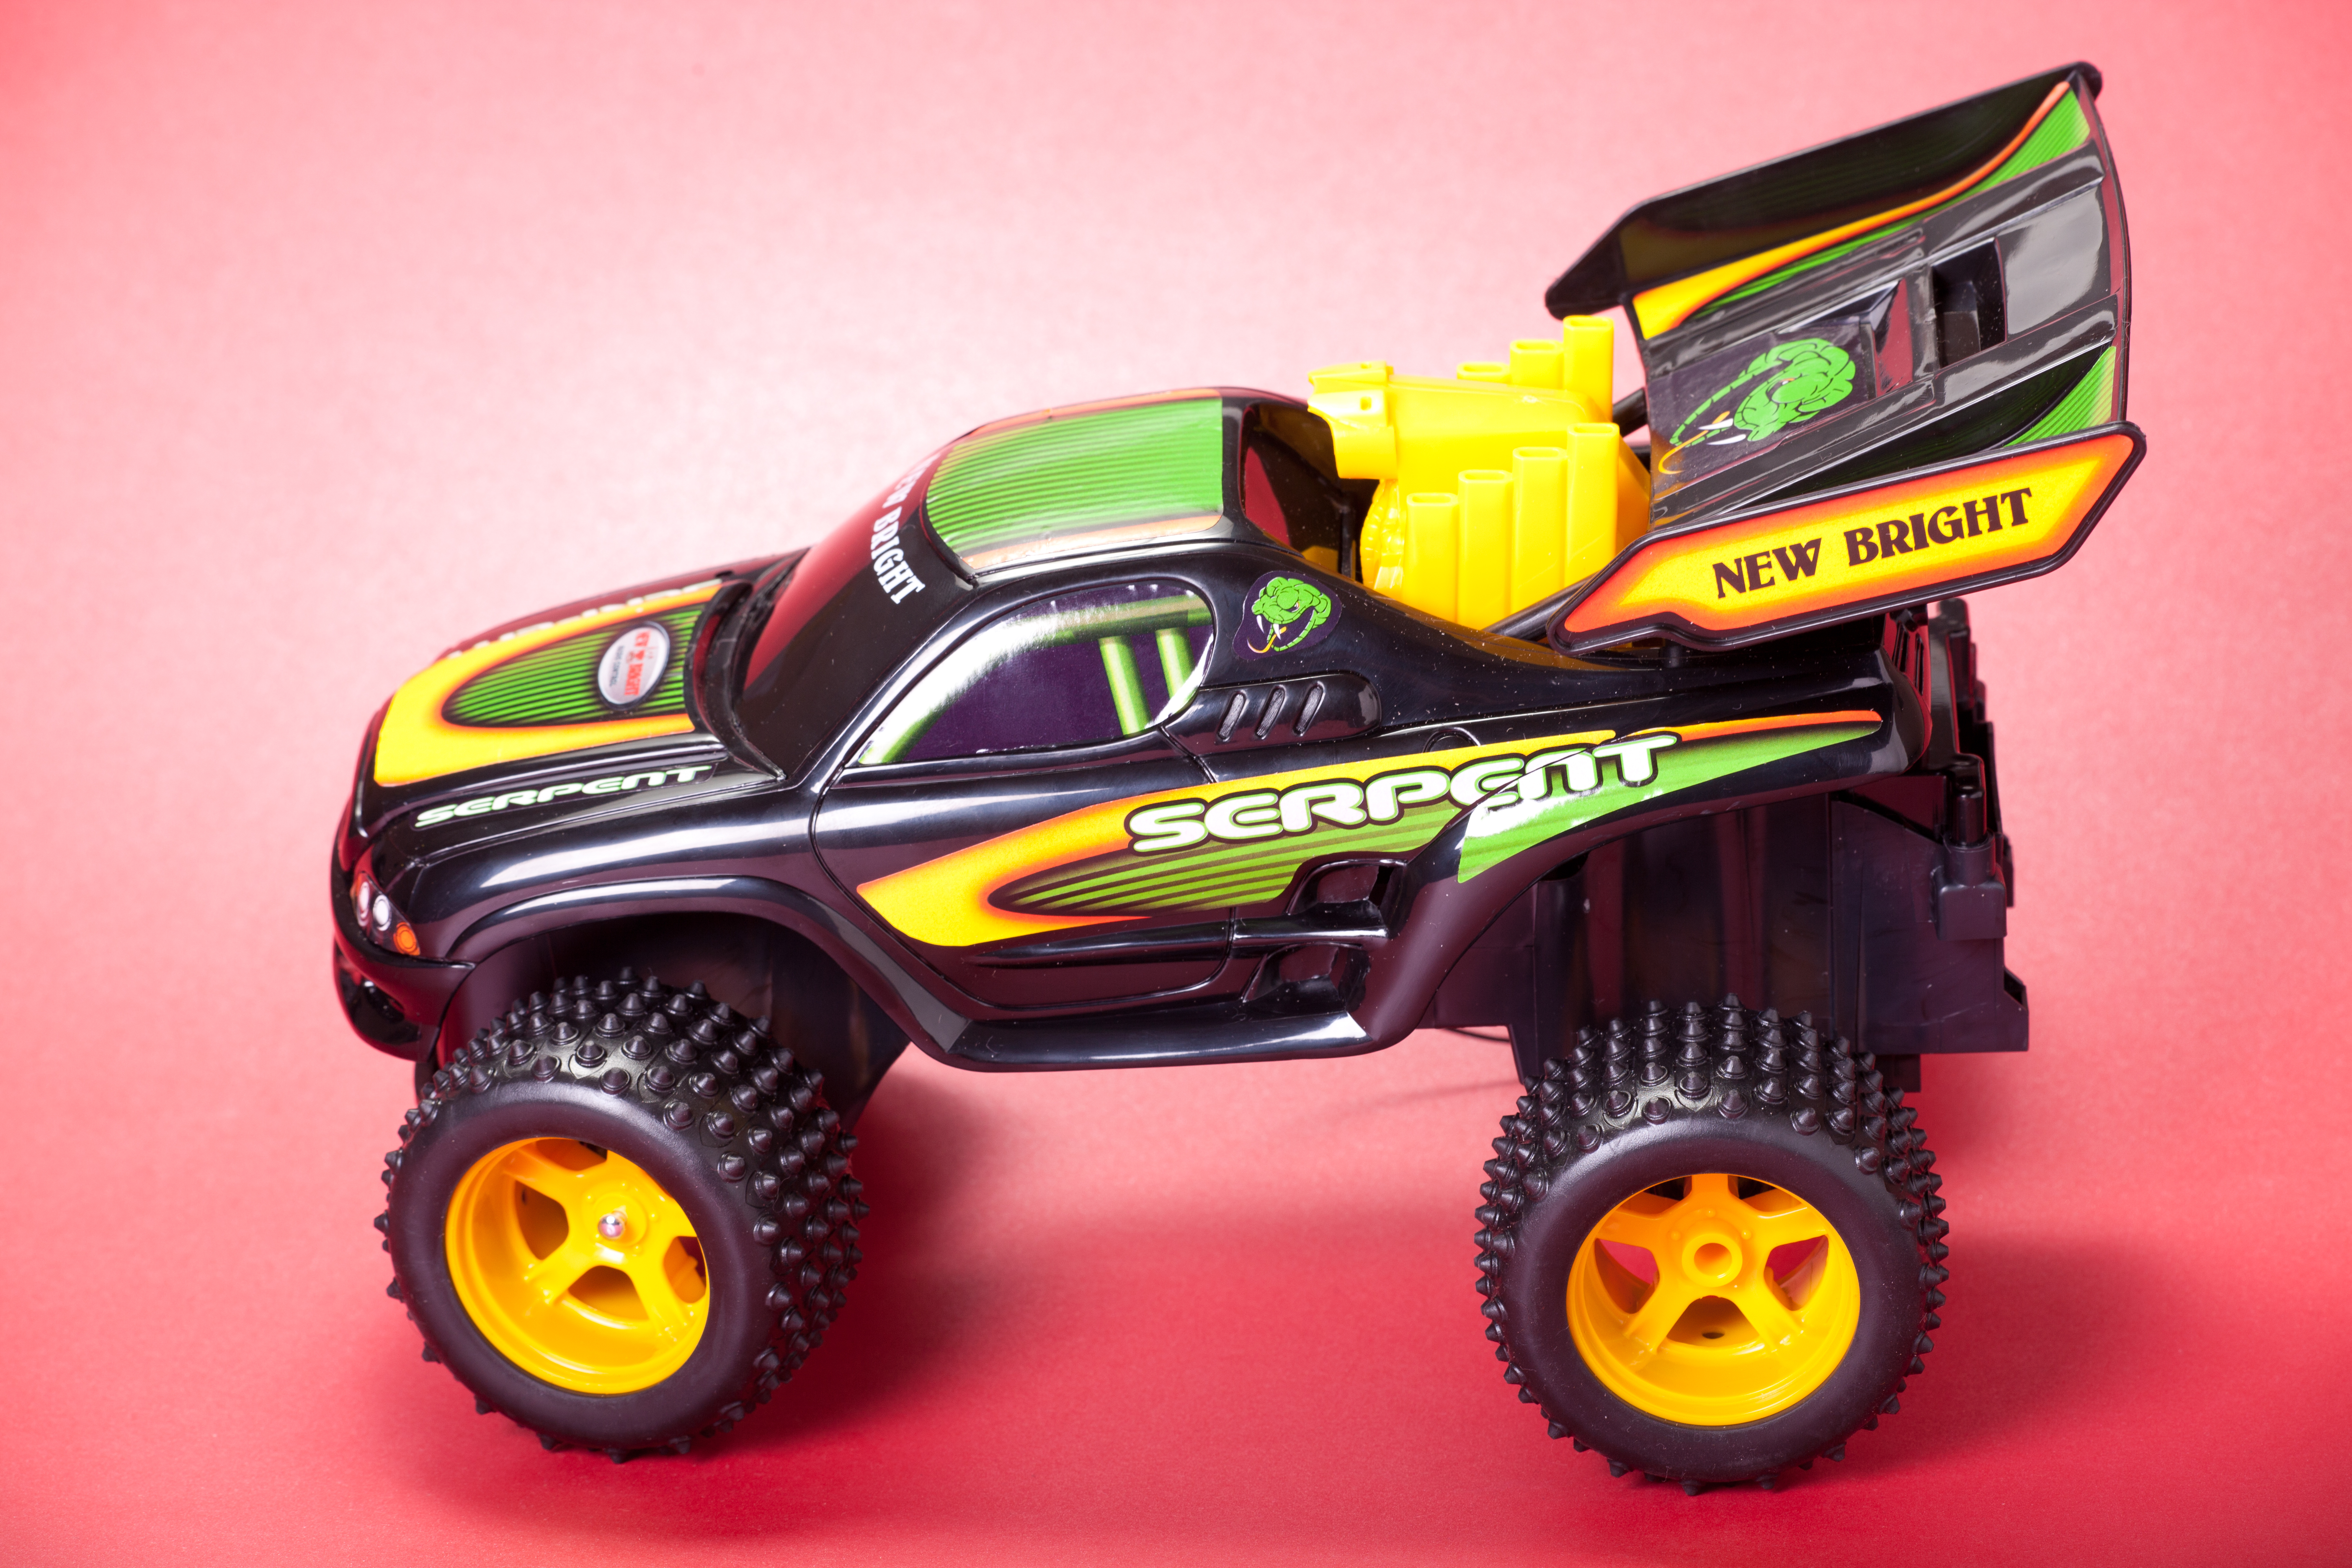 Toy car photo